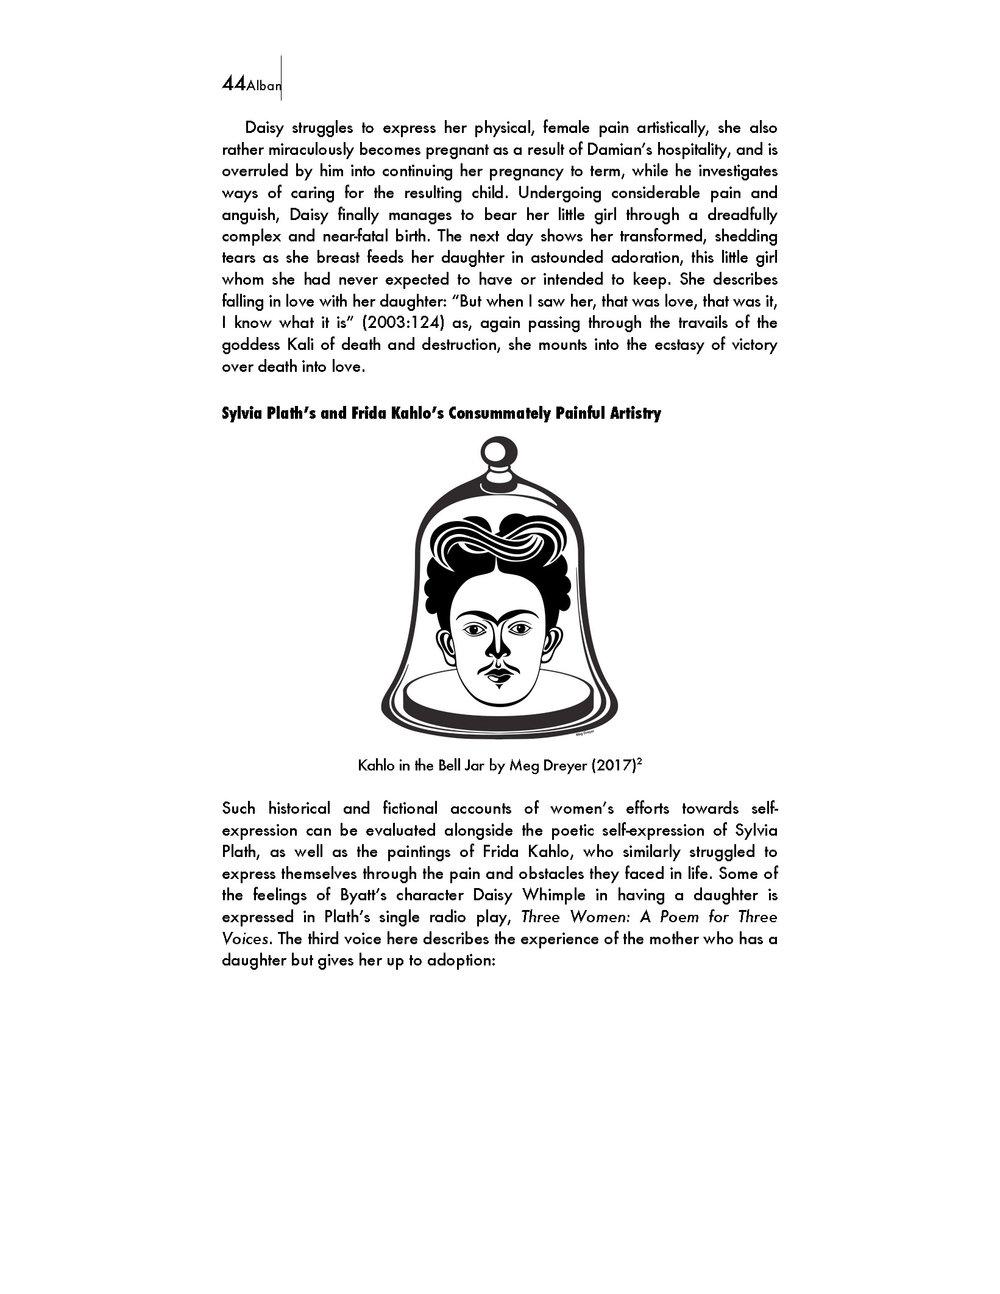 StrugglingStupendousFemalep31_Page_14.jpg